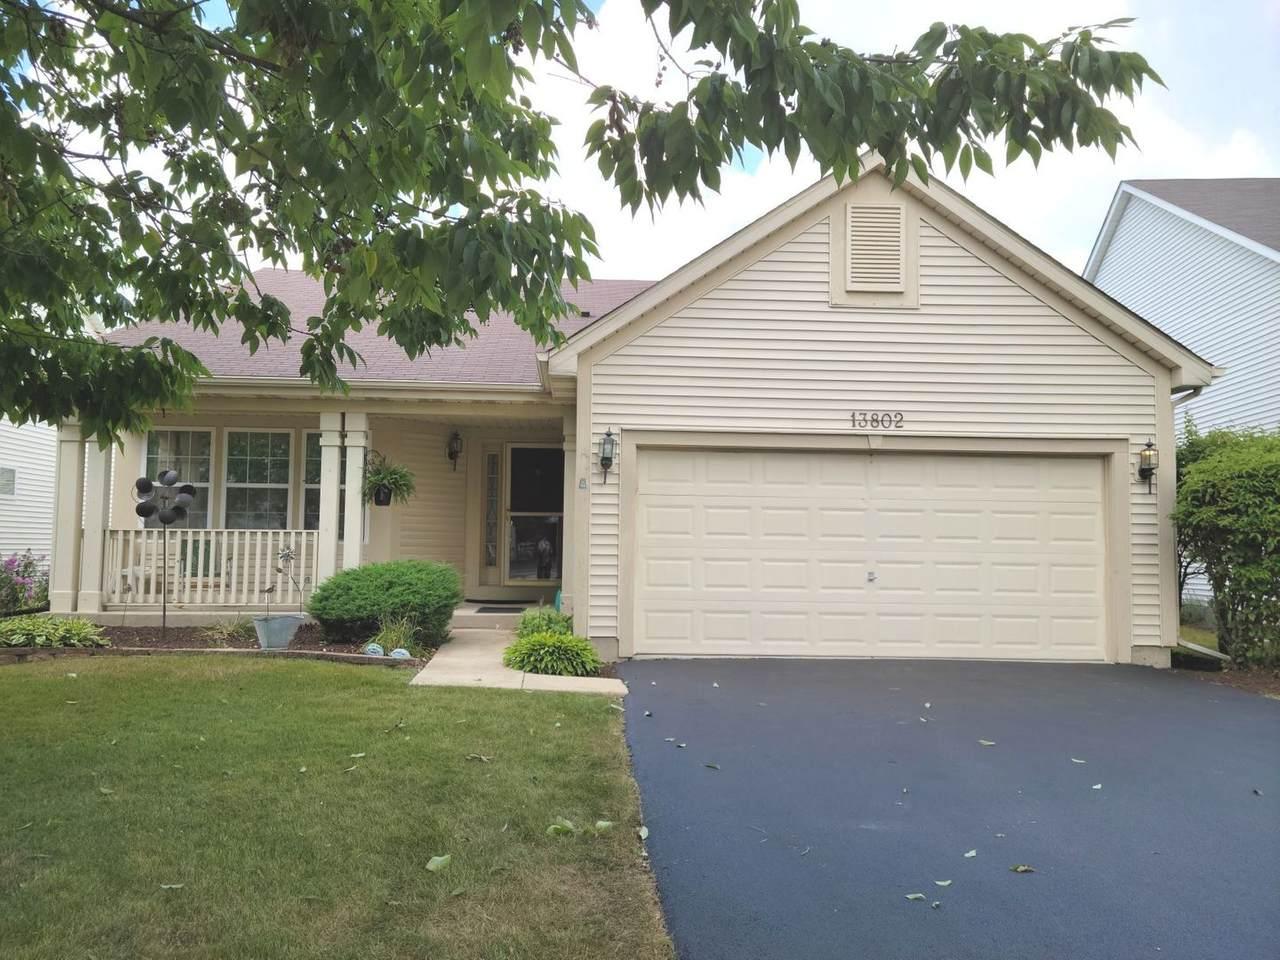 13802 Ironwood Drive - Photo 1